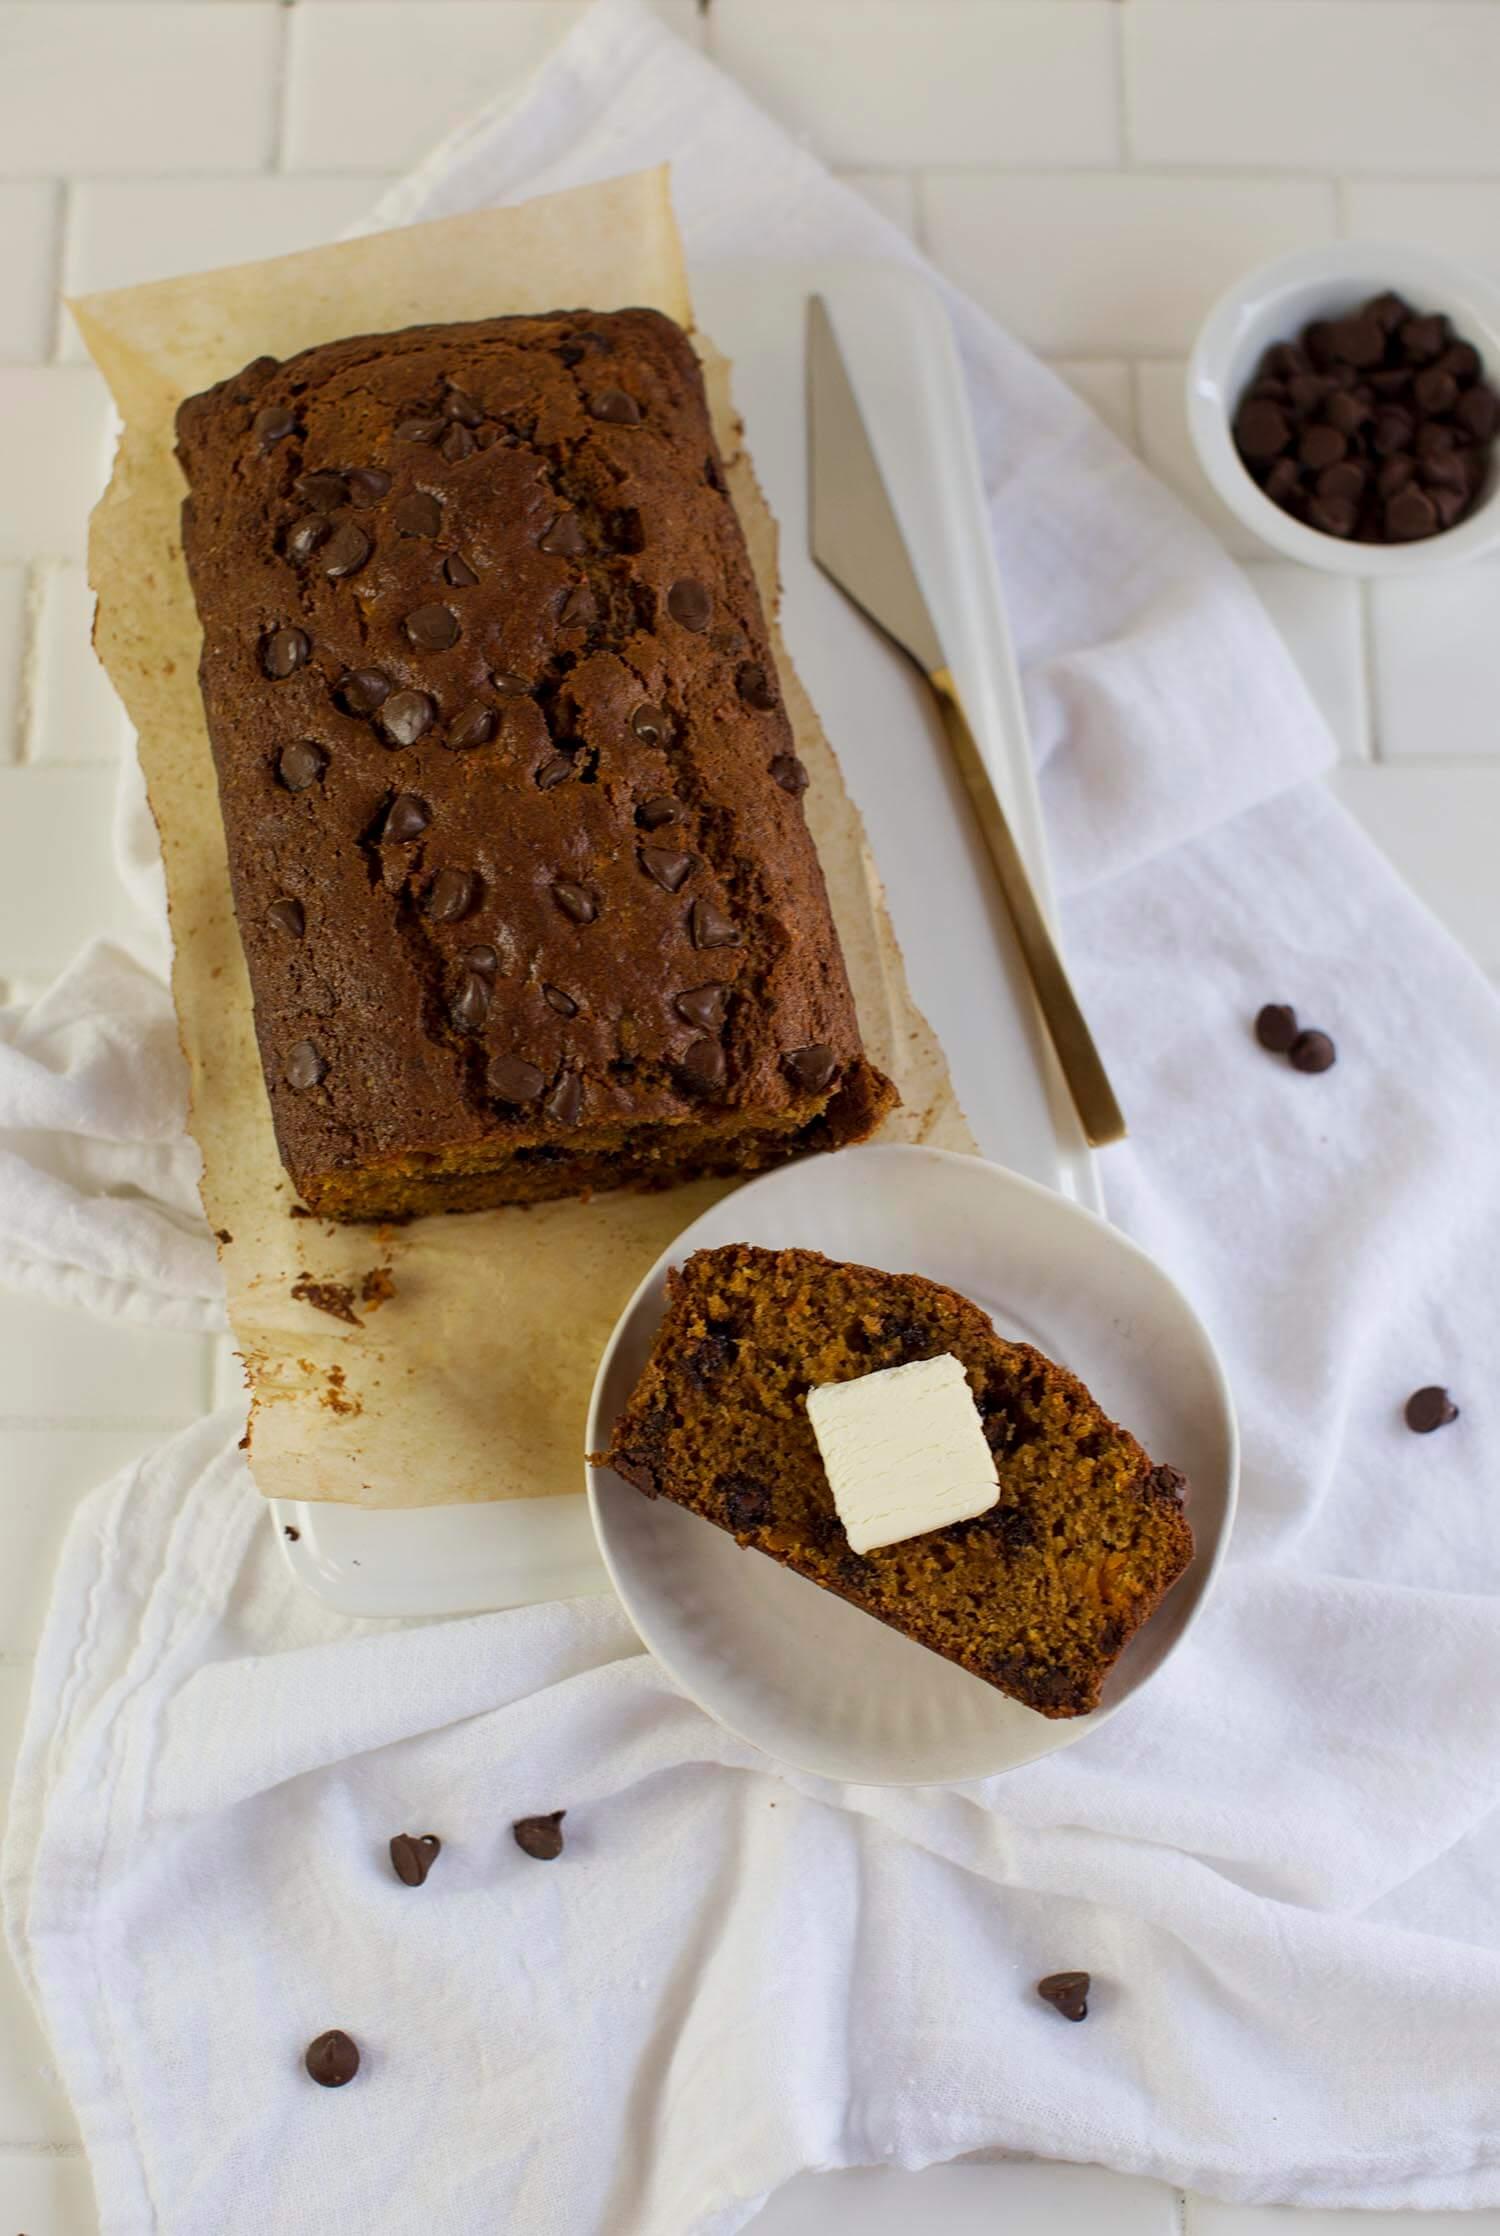 Butternut and Chocolate Bread (via abeautifulmess.com)